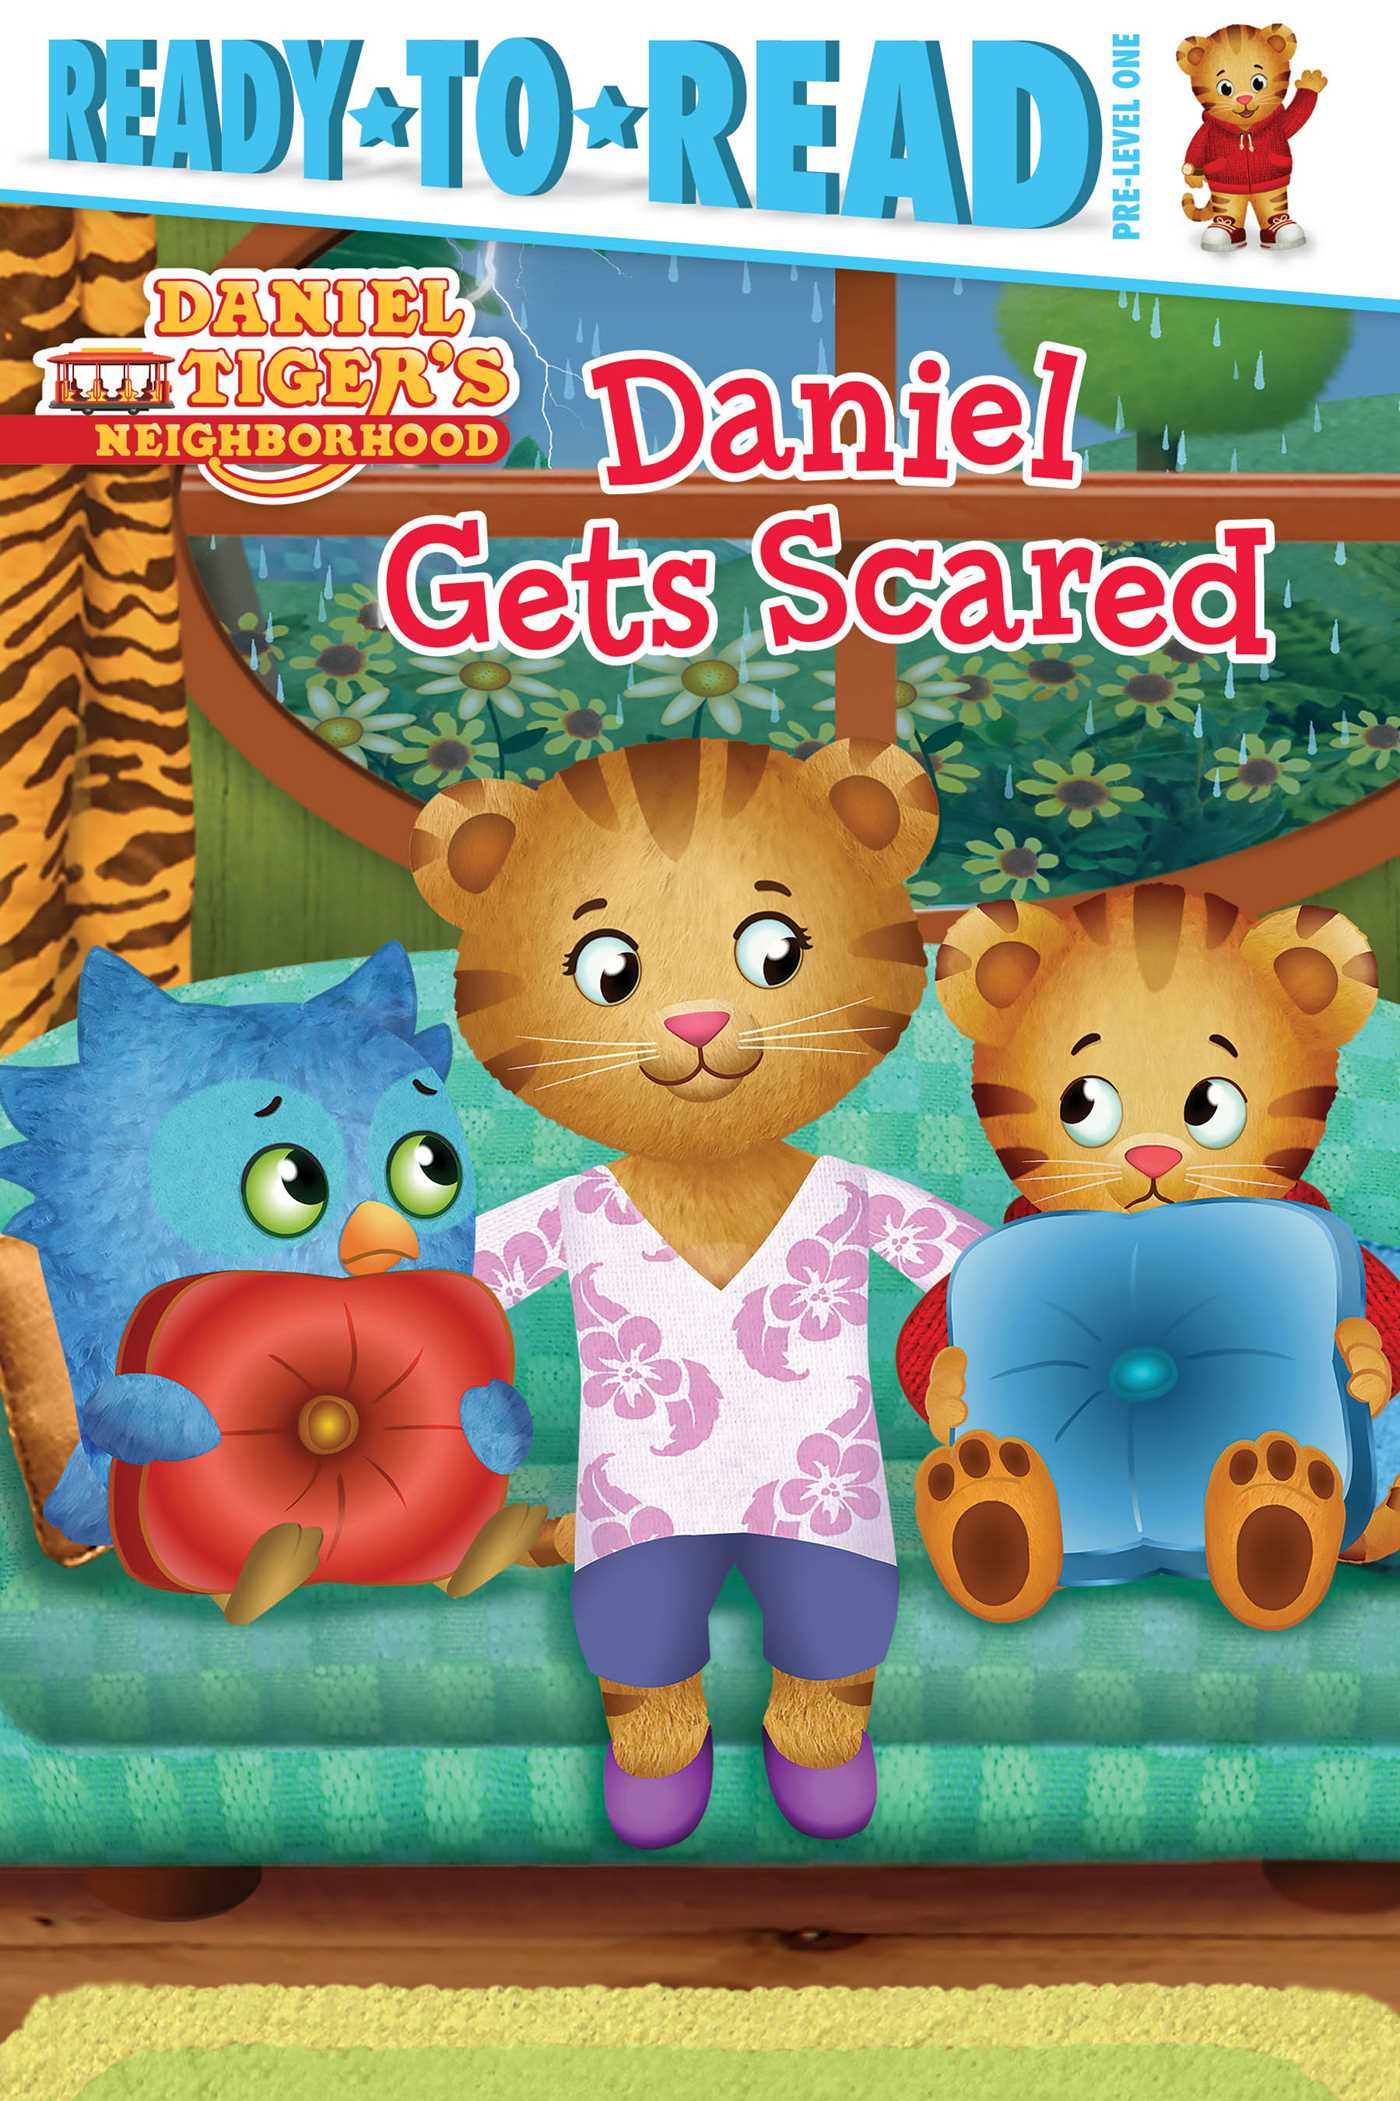 Daniel gets scared 9781481452571 hr